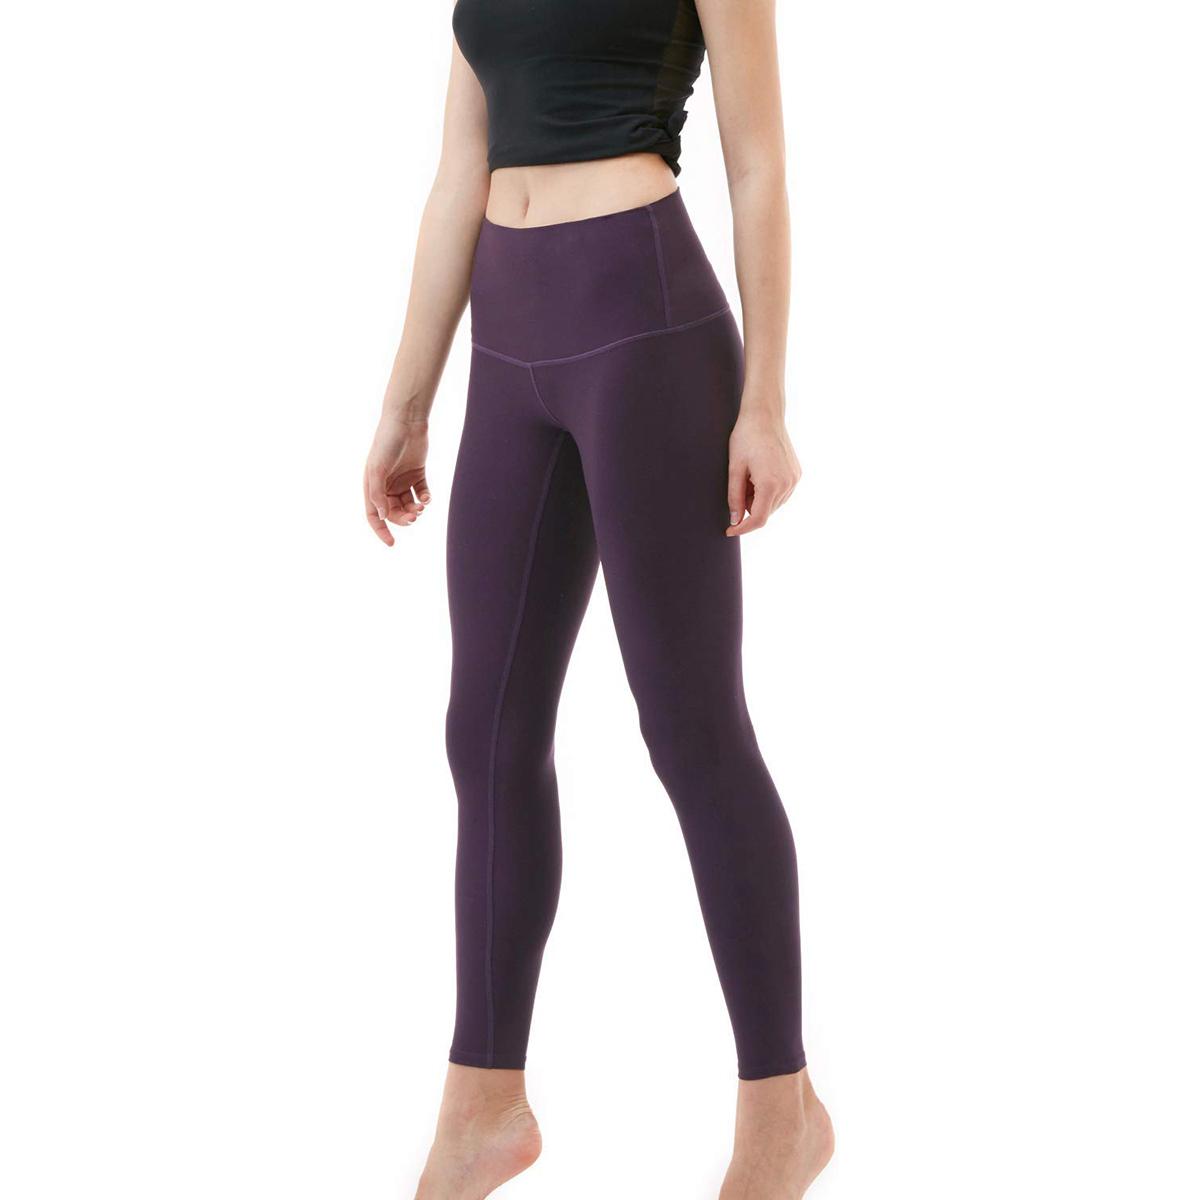 thumbnail 23 - TSLA Tesla FYP52 Women's High-Waisted Ultra-Stretch Tummy Control Yoga Pants